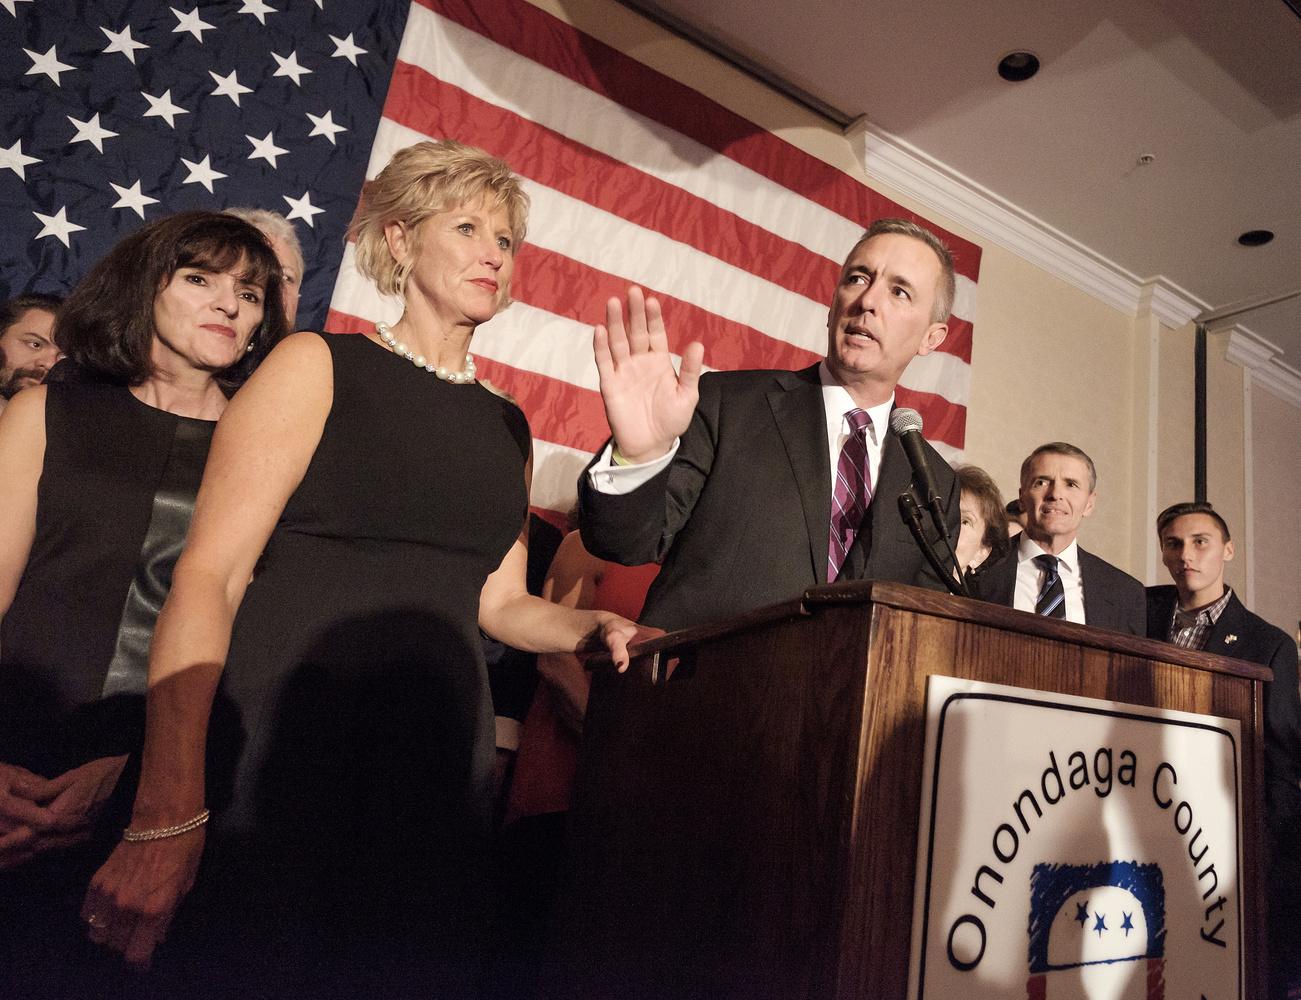 Congressman John Katko wins re-election by Wasim Ahmad